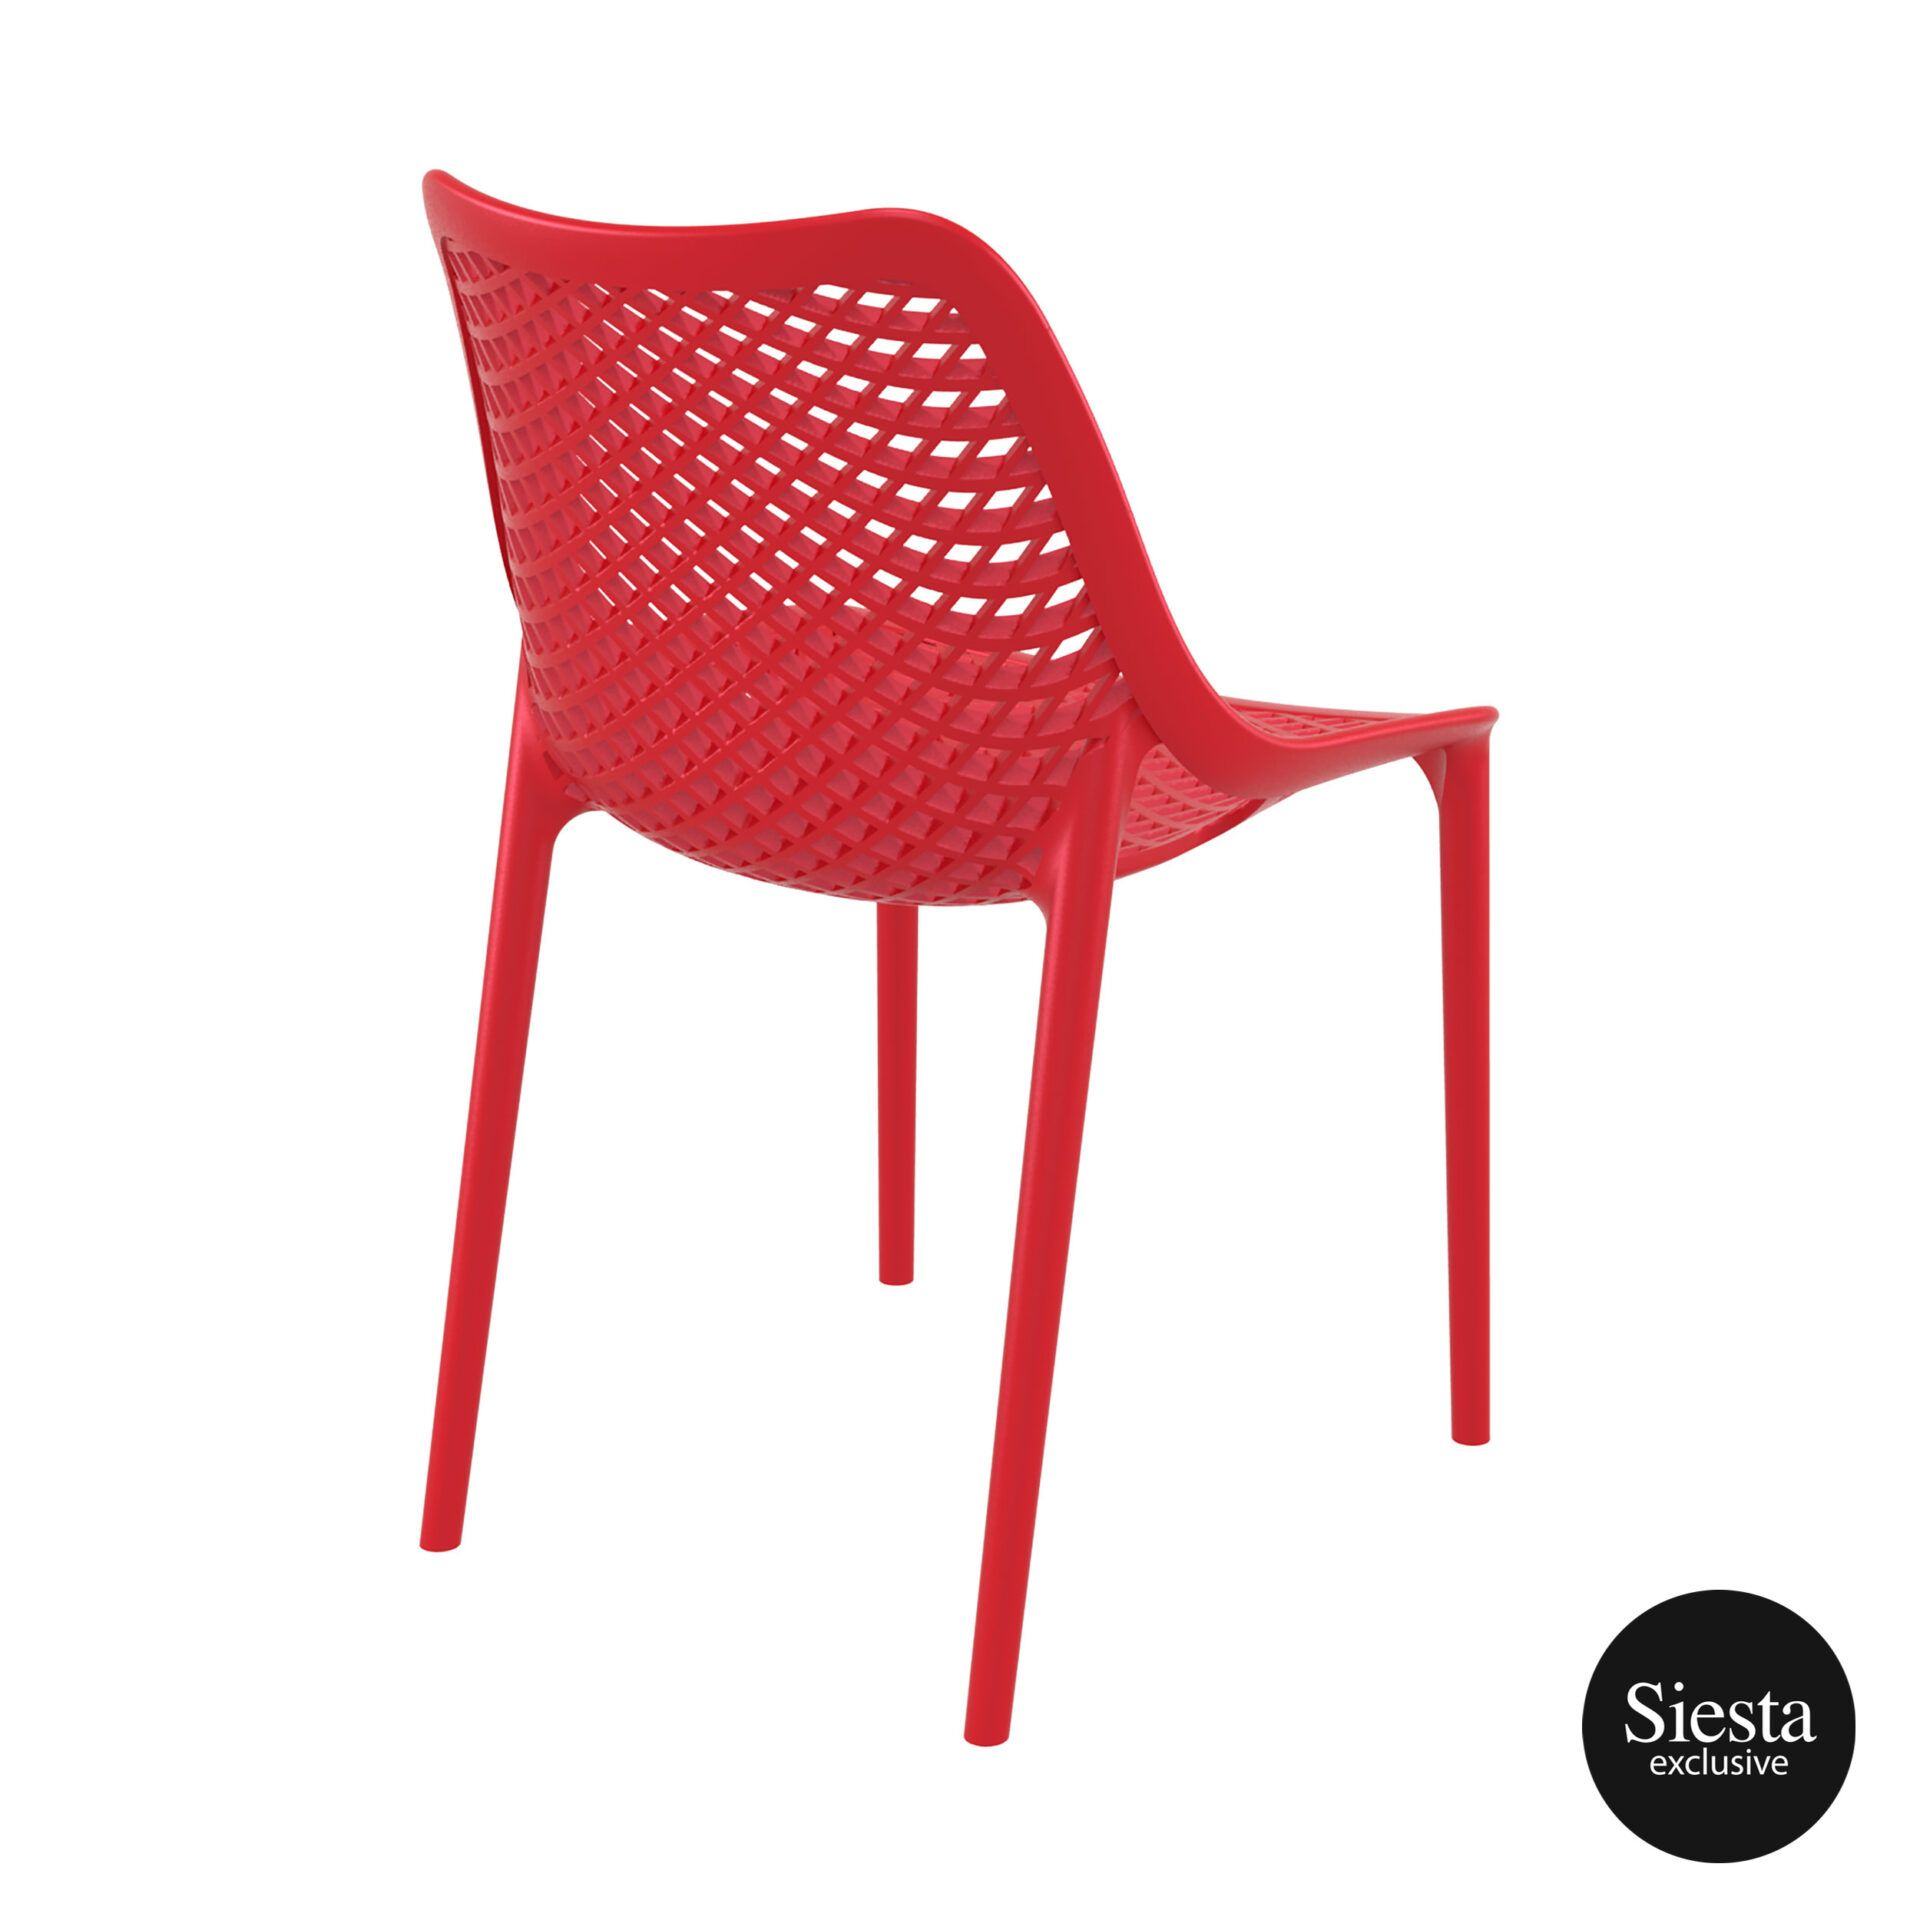 original siesta air chair red back side 1